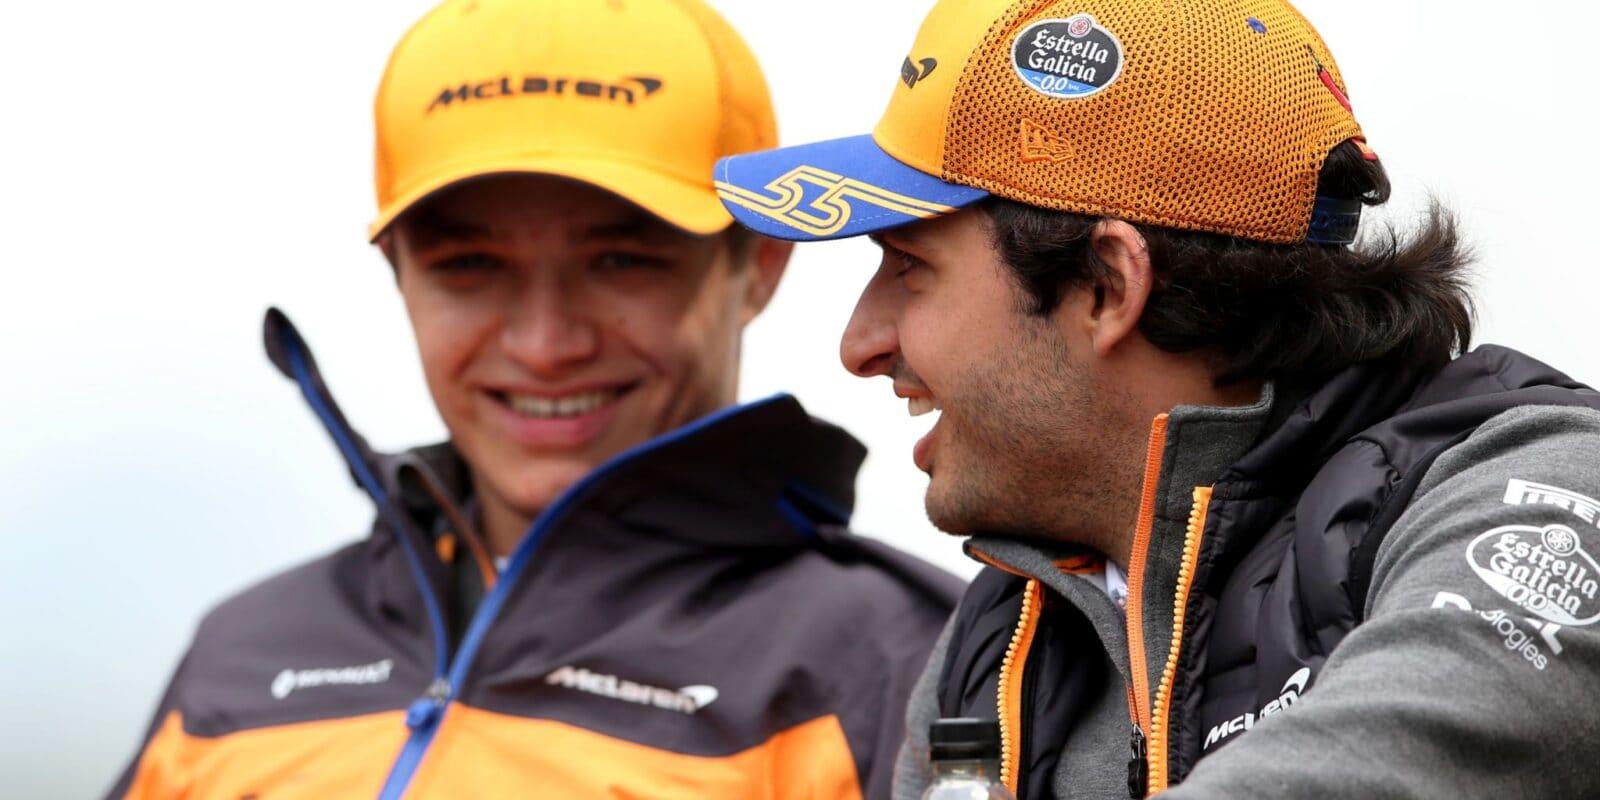 Norris se zachoval jako gentleman, chválí kolegu Sainz